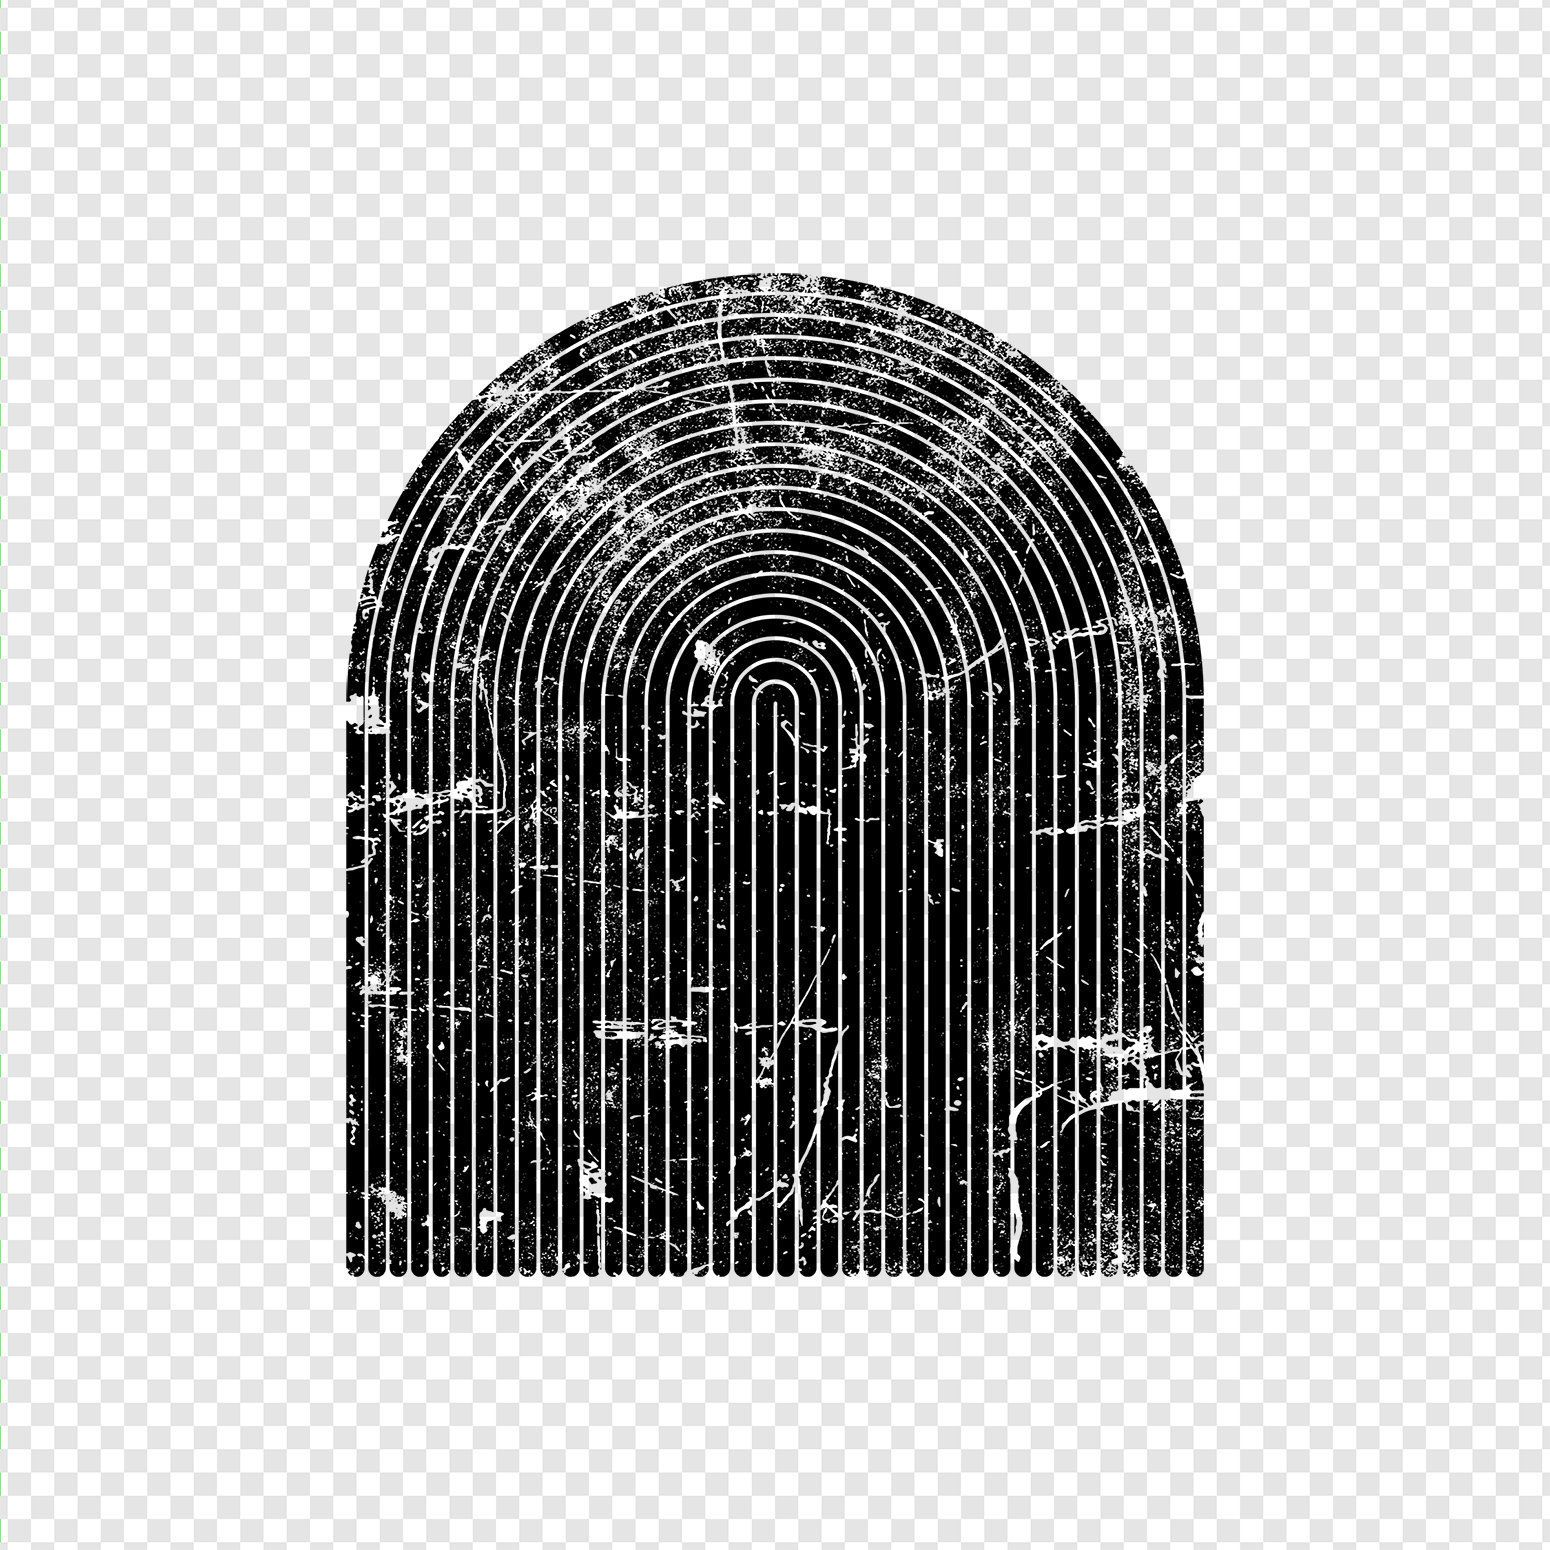 Geometric Half Circle Arch Png Scandinavian Scandi Wall Etsy Digital Art Prints Abstract Decor Geometric